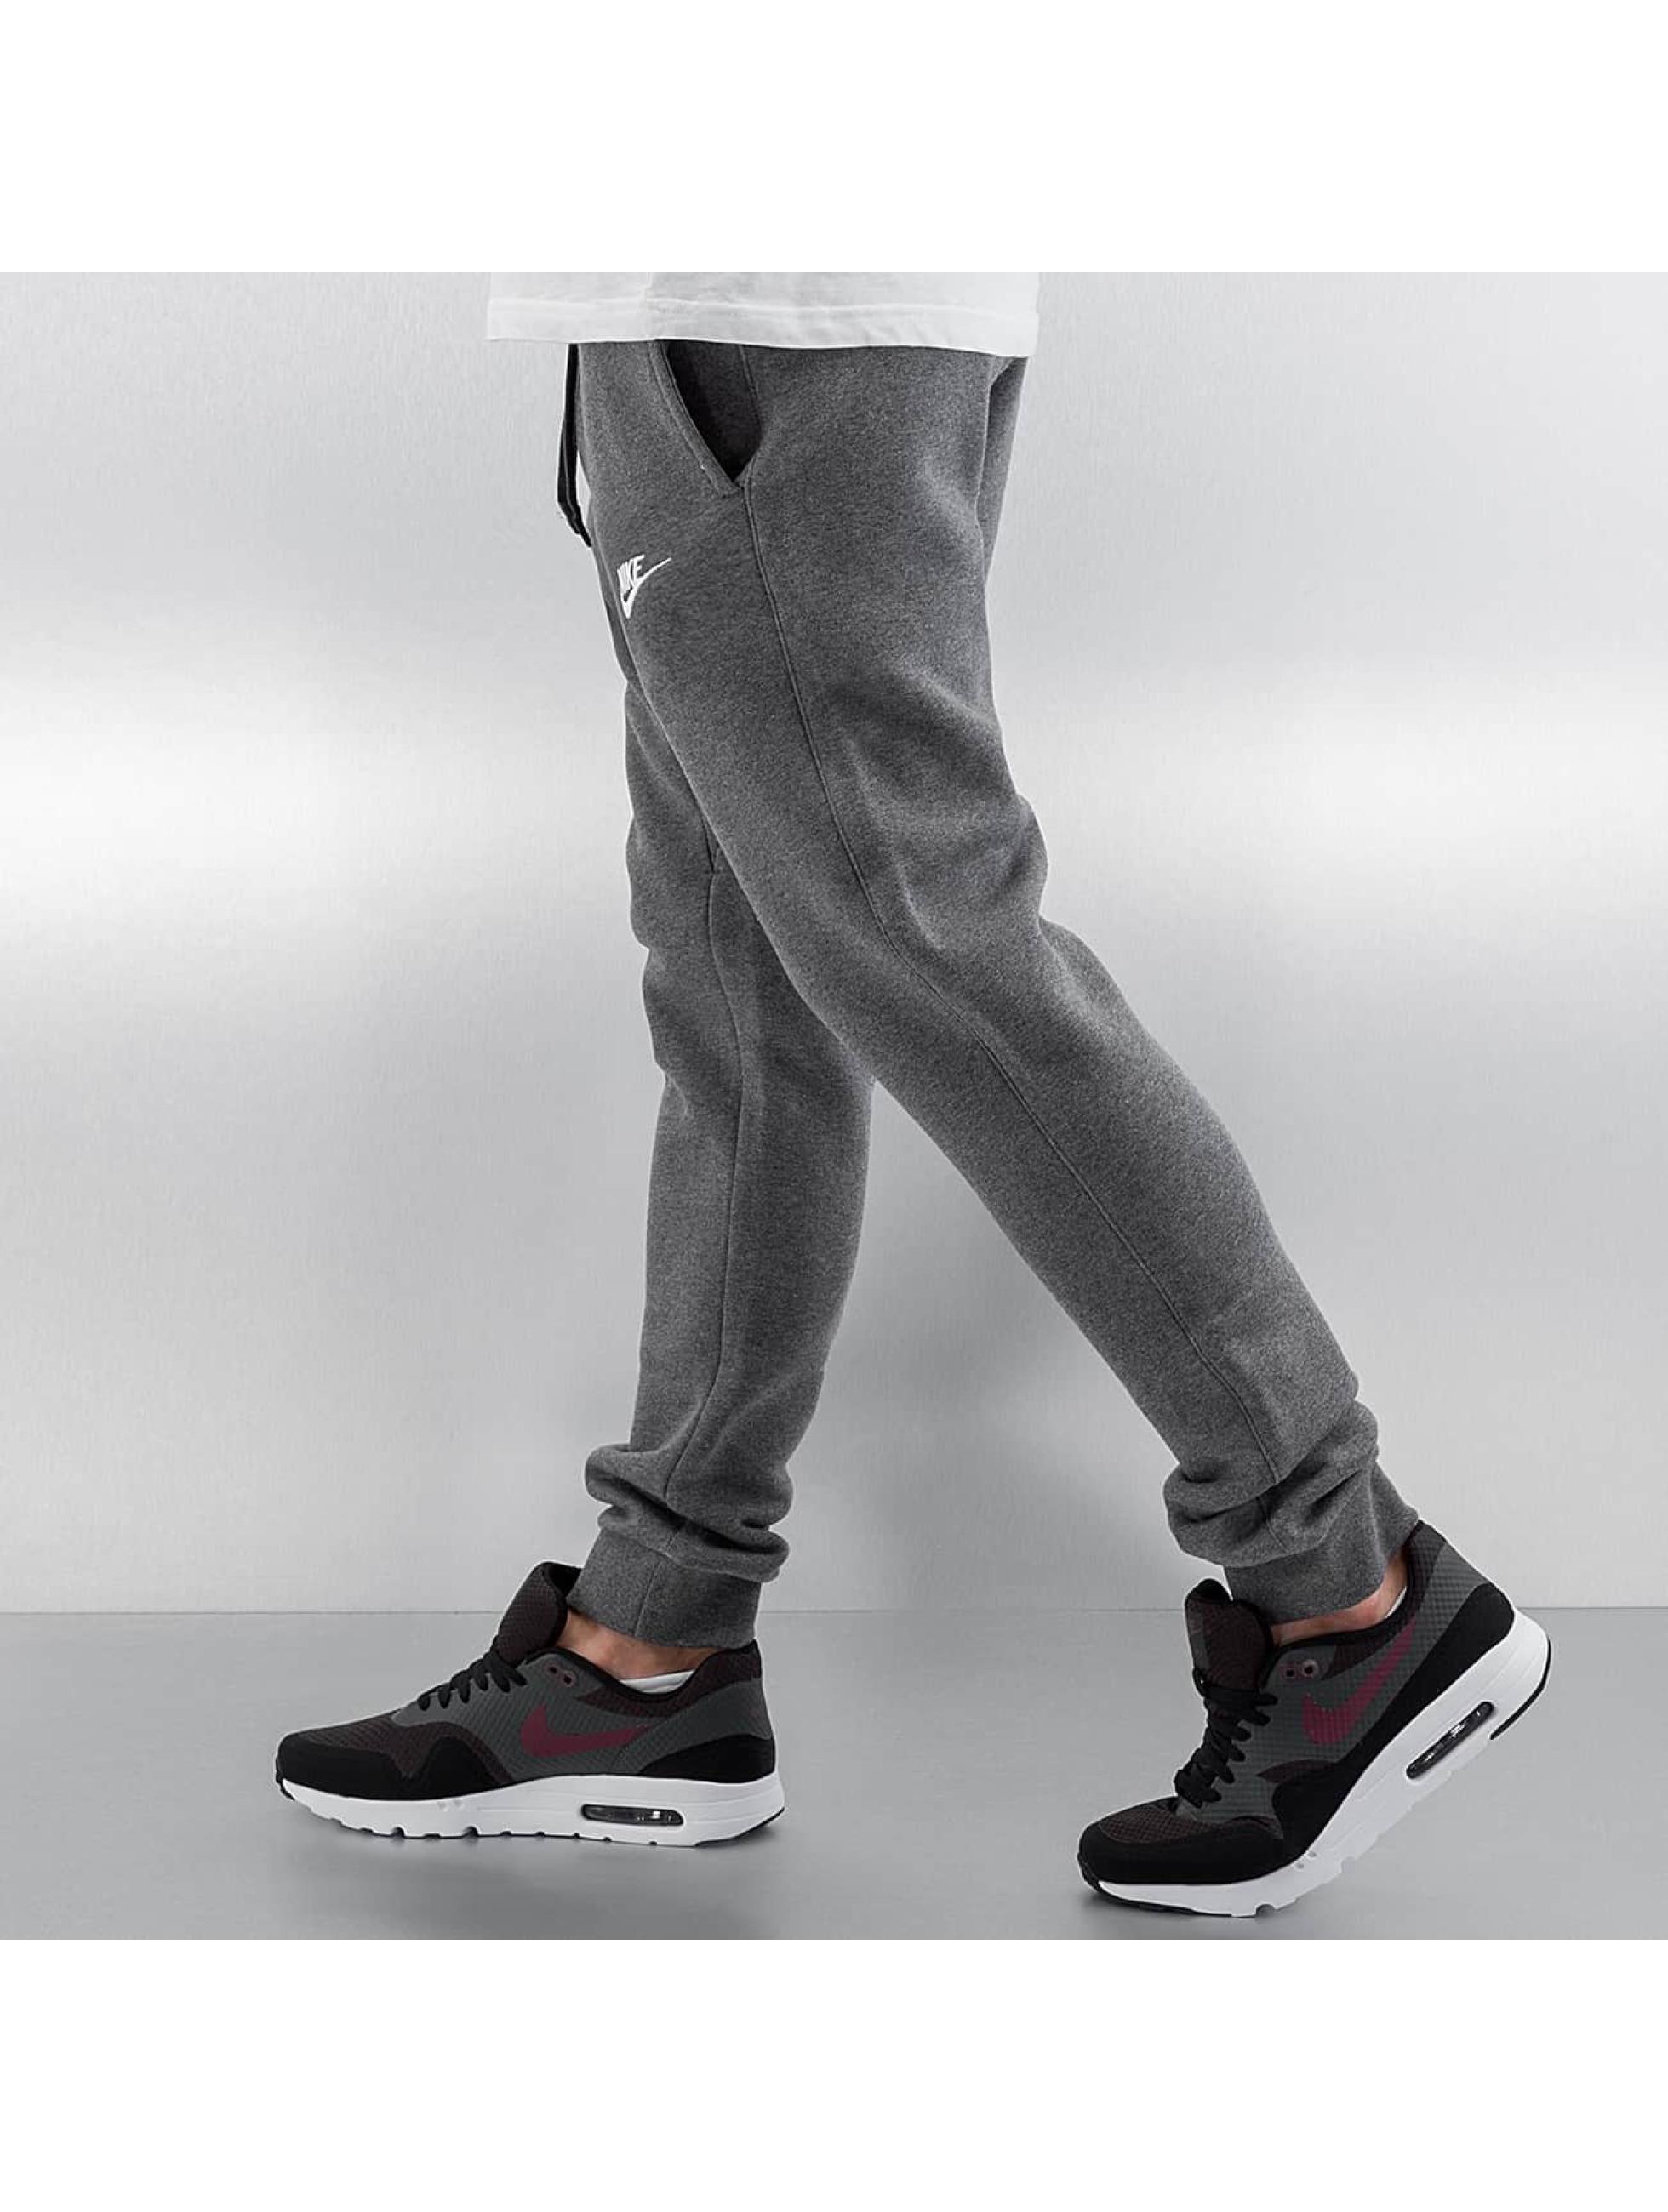 nike nsw flc club gris homme jogging nike acheter pas cher pantalon 257542. Black Bedroom Furniture Sets. Home Design Ideas